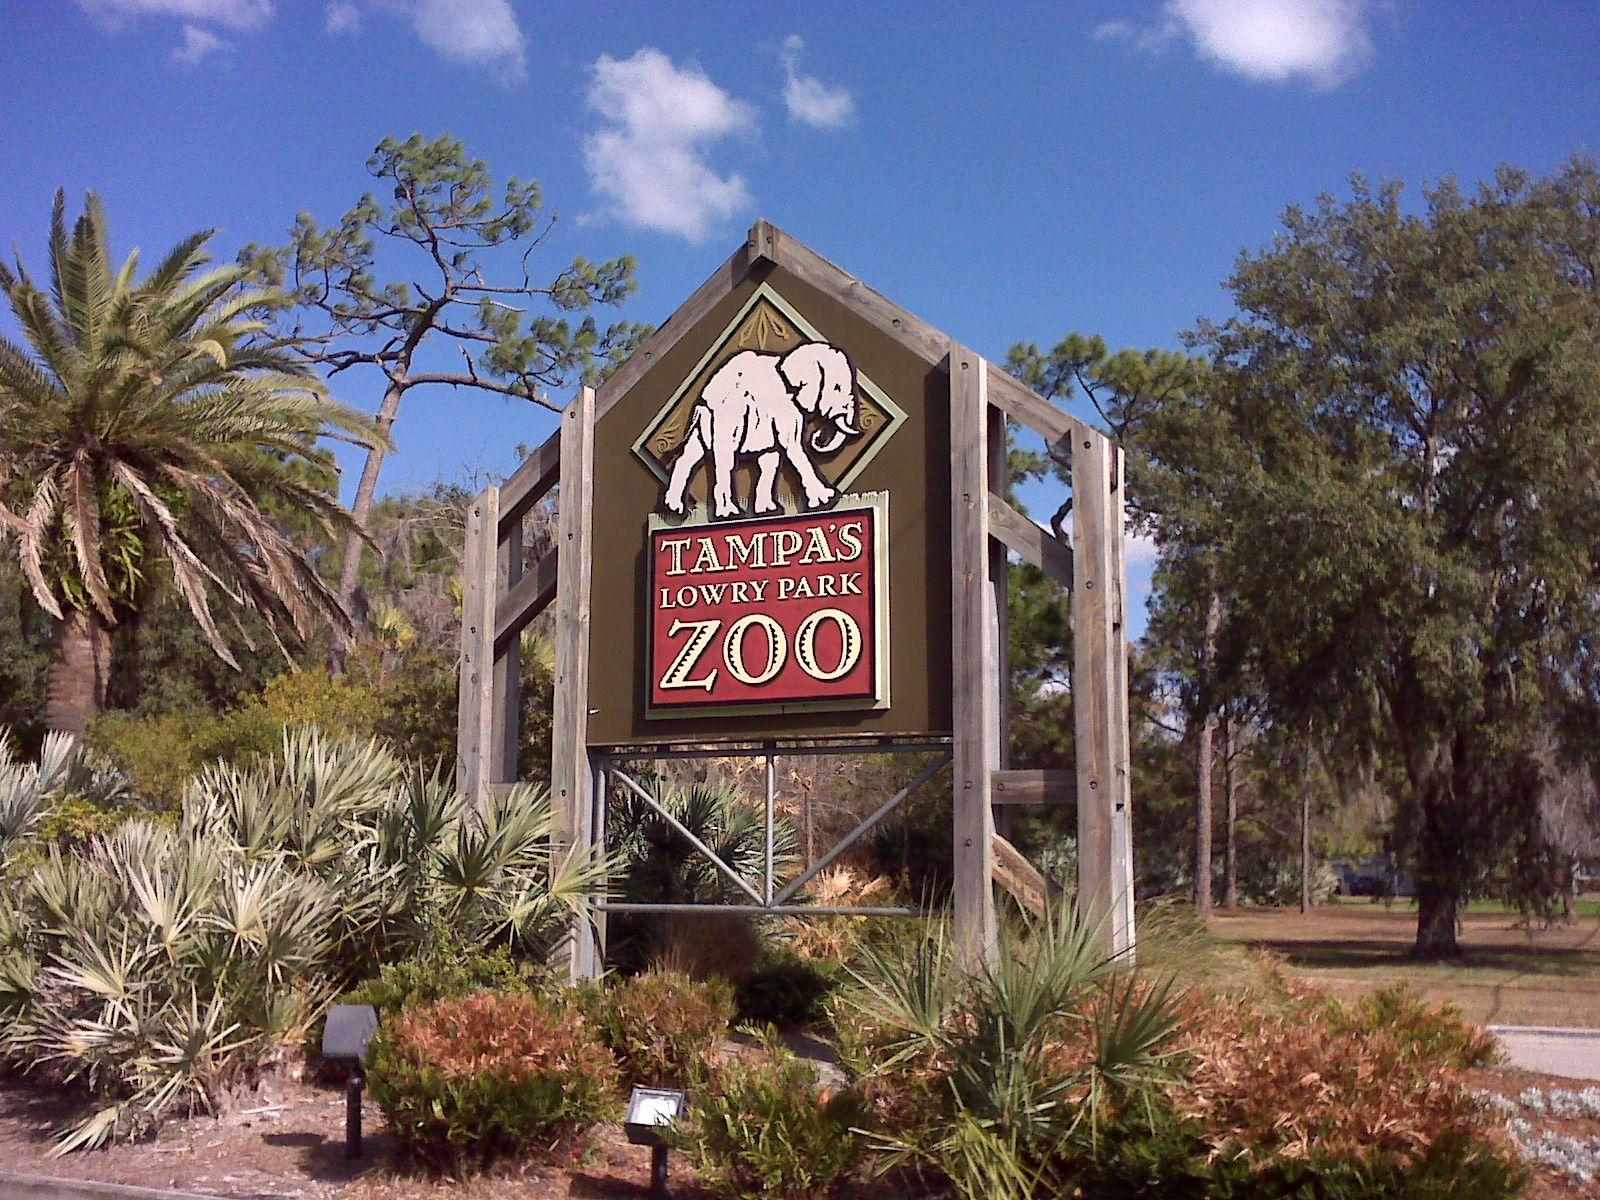 Lowry Park Zoo Tampa Fl Tampa Zoo Tampa Florida Florida Travel Guide